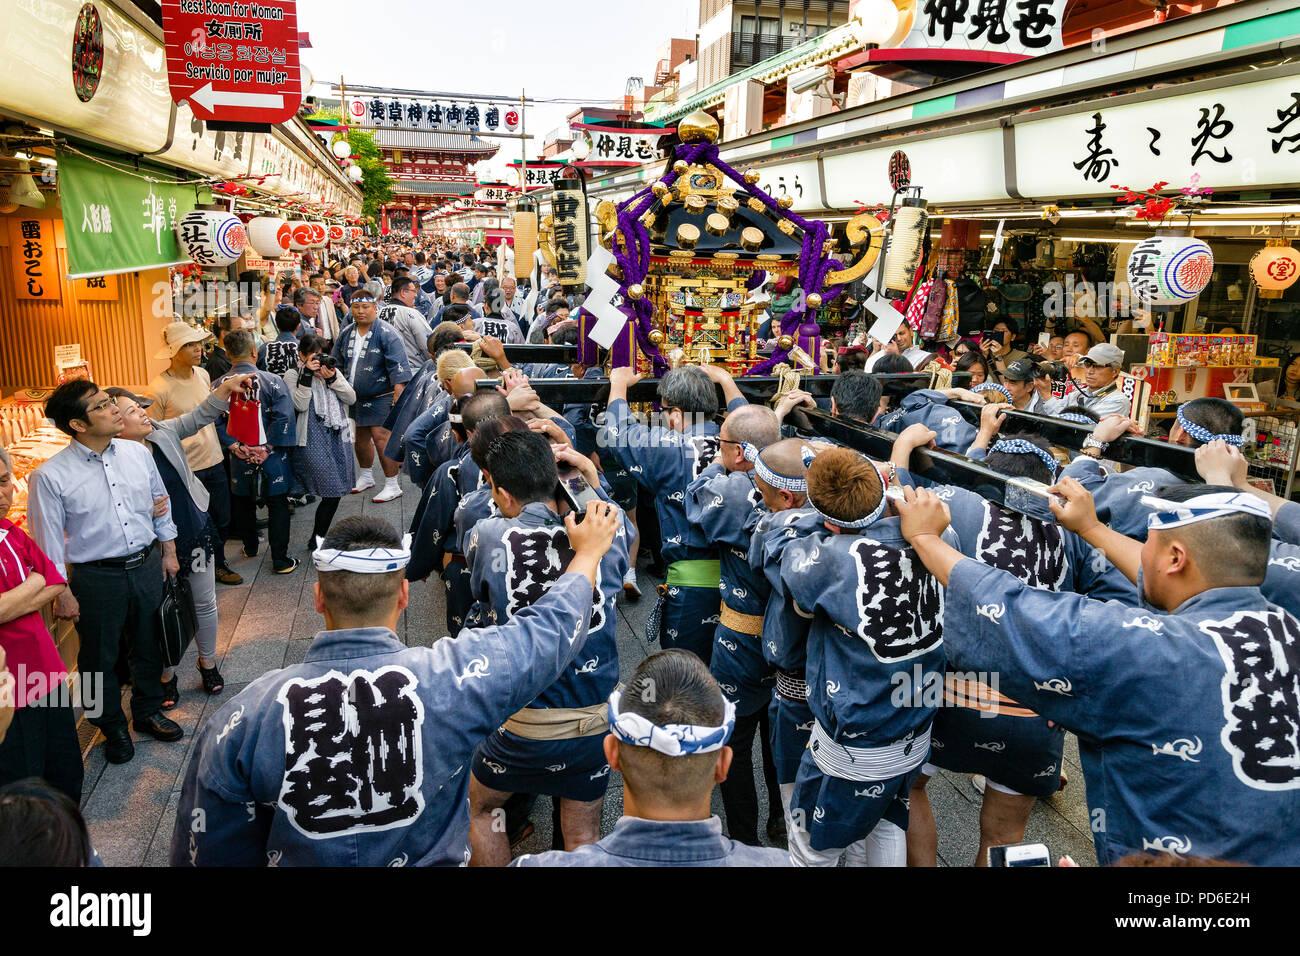 Giappone, isola di Honshu, Kanto, Tokyo, il Sanja matsuri. Immagini Stock